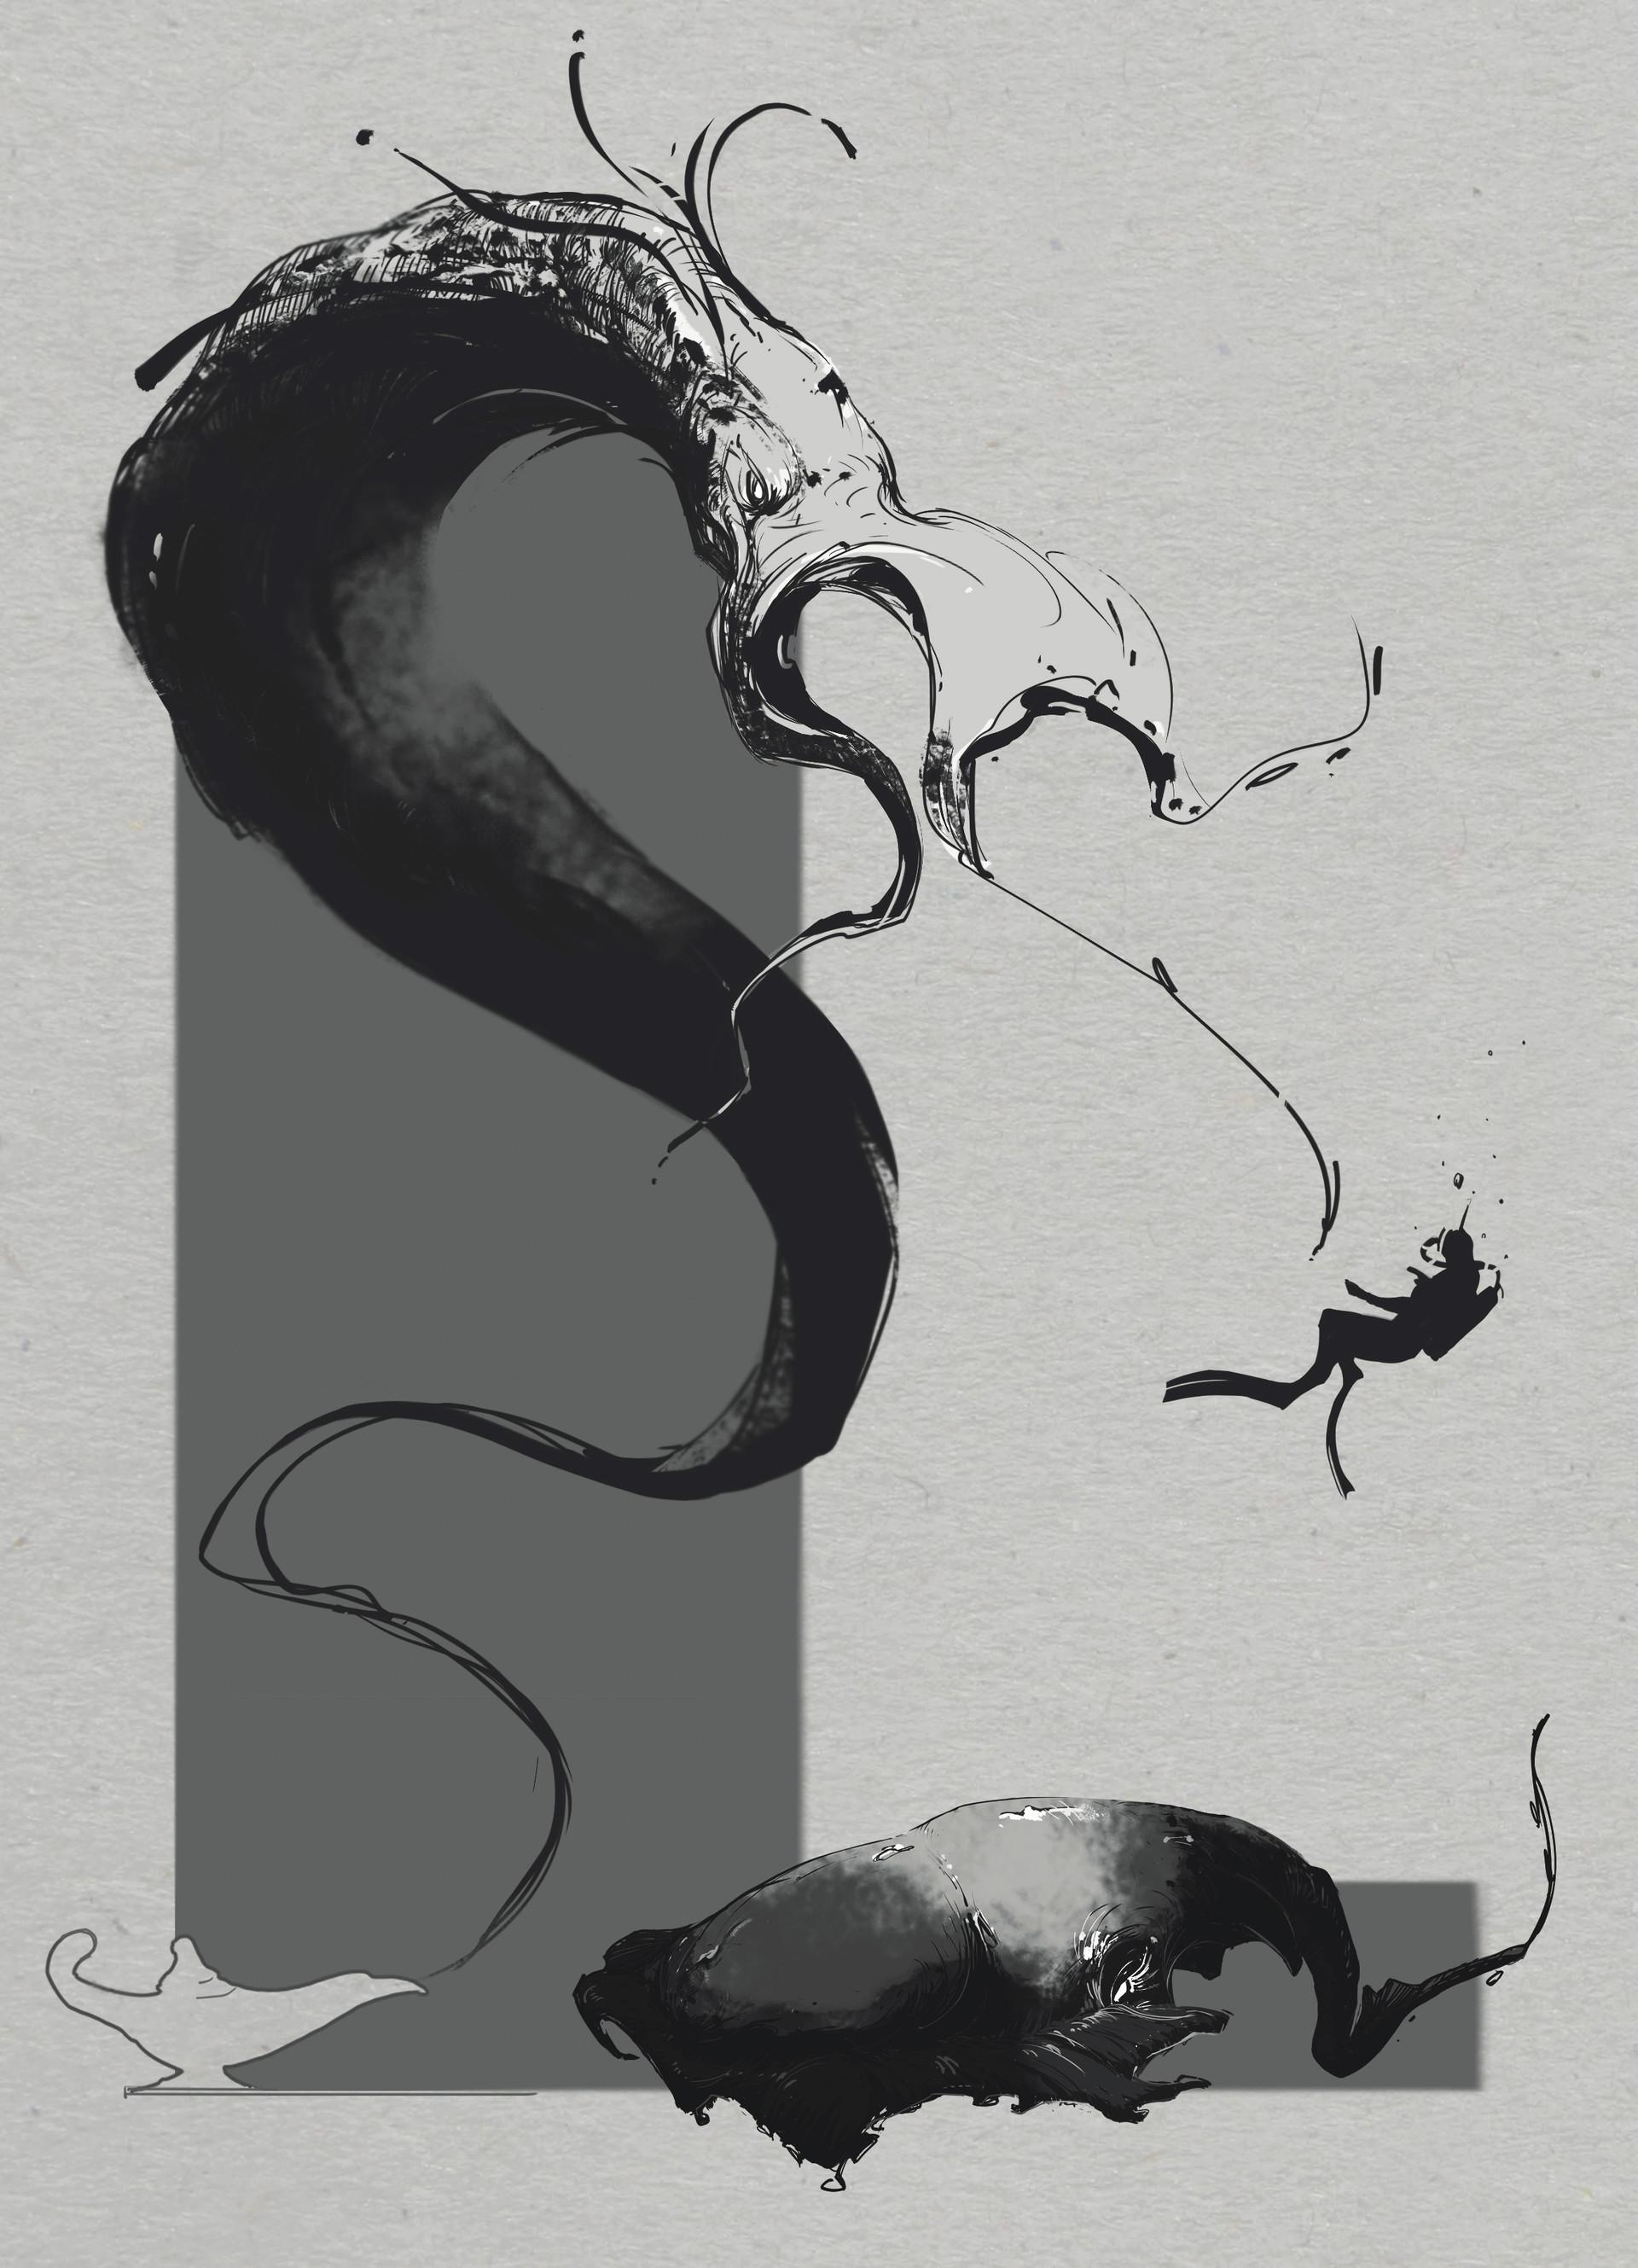 arash-razavi-12a-see-creature